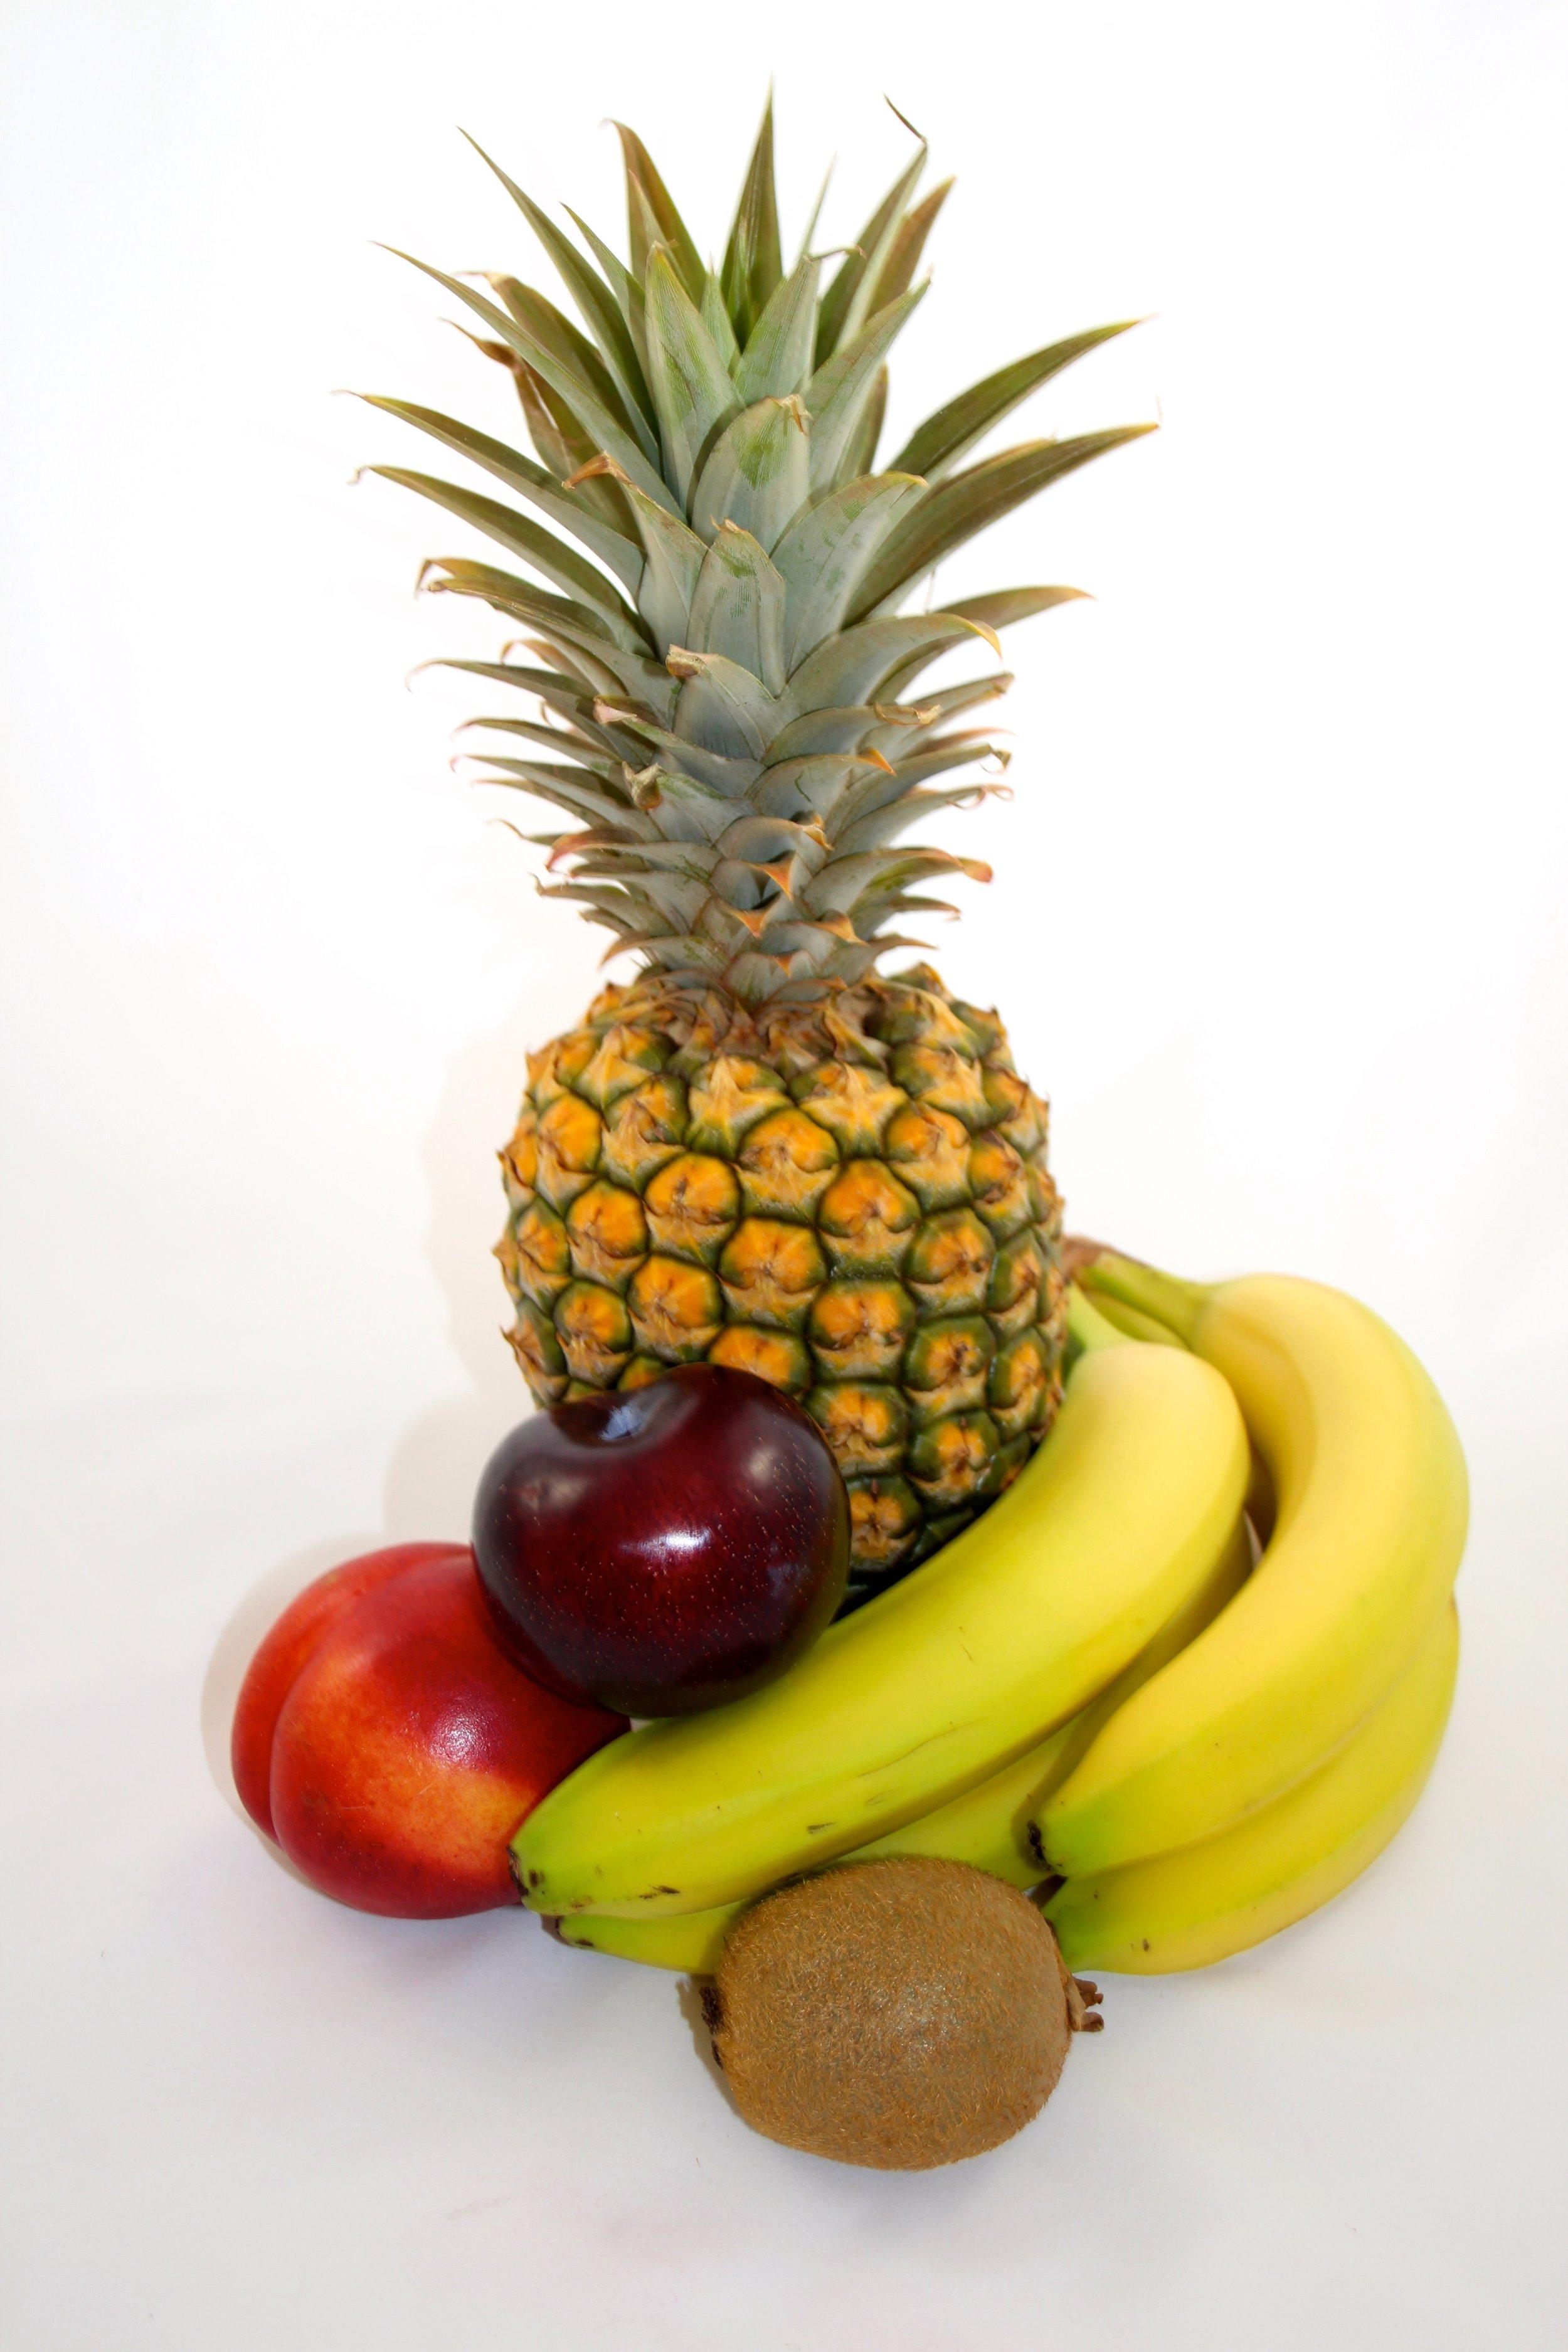 apple-banana-delicious-775578.jpg